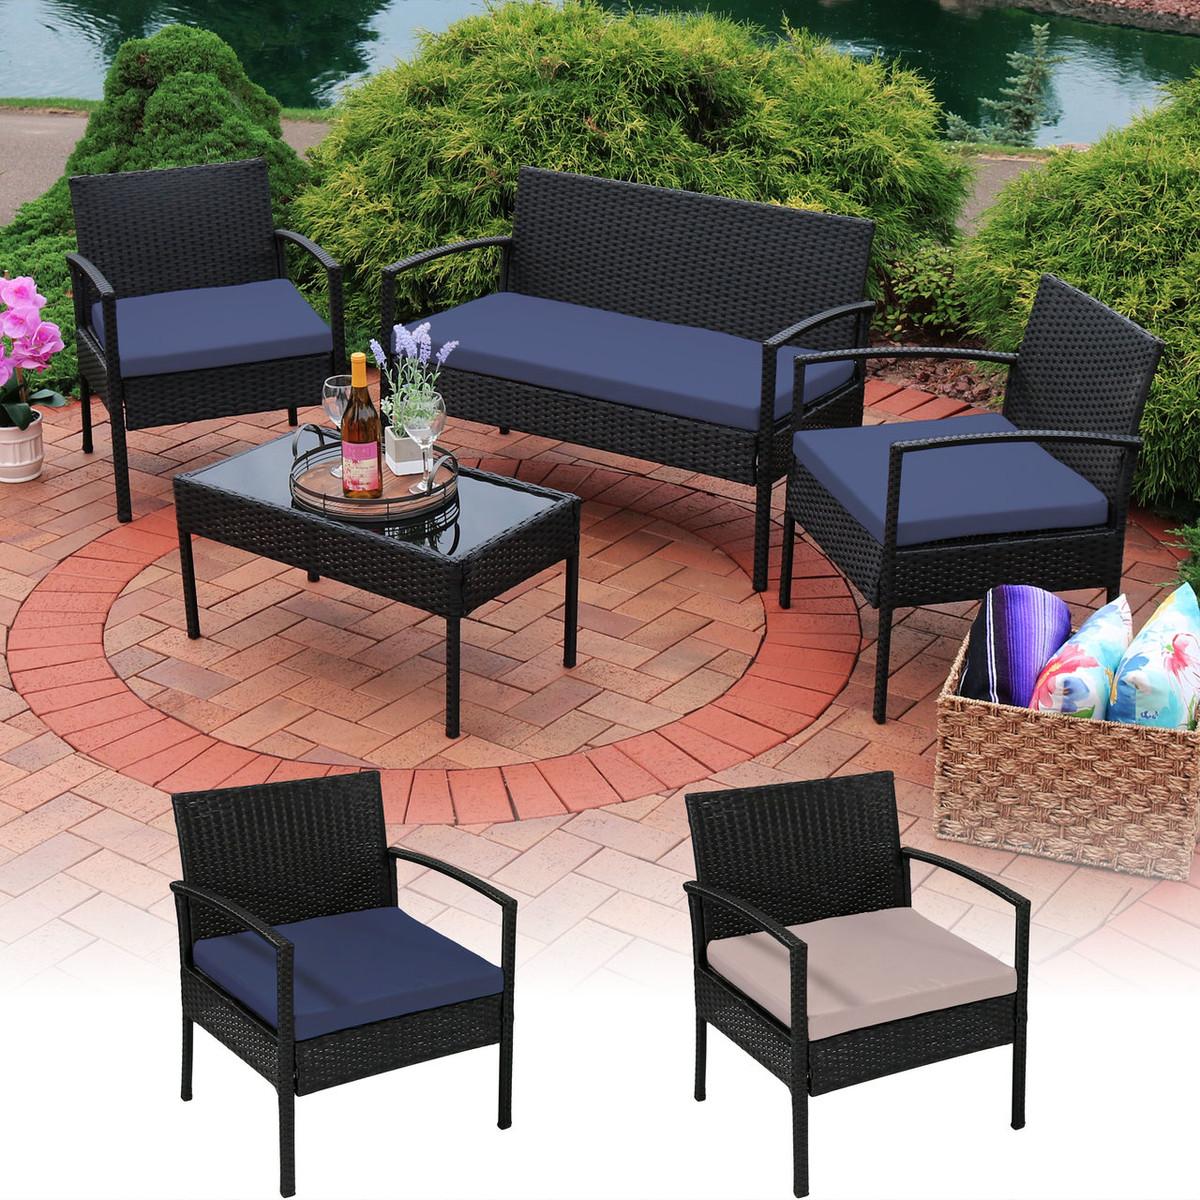 Sunnydaze Anadia 4-Piece Lounger Patio Furniture Set with ...